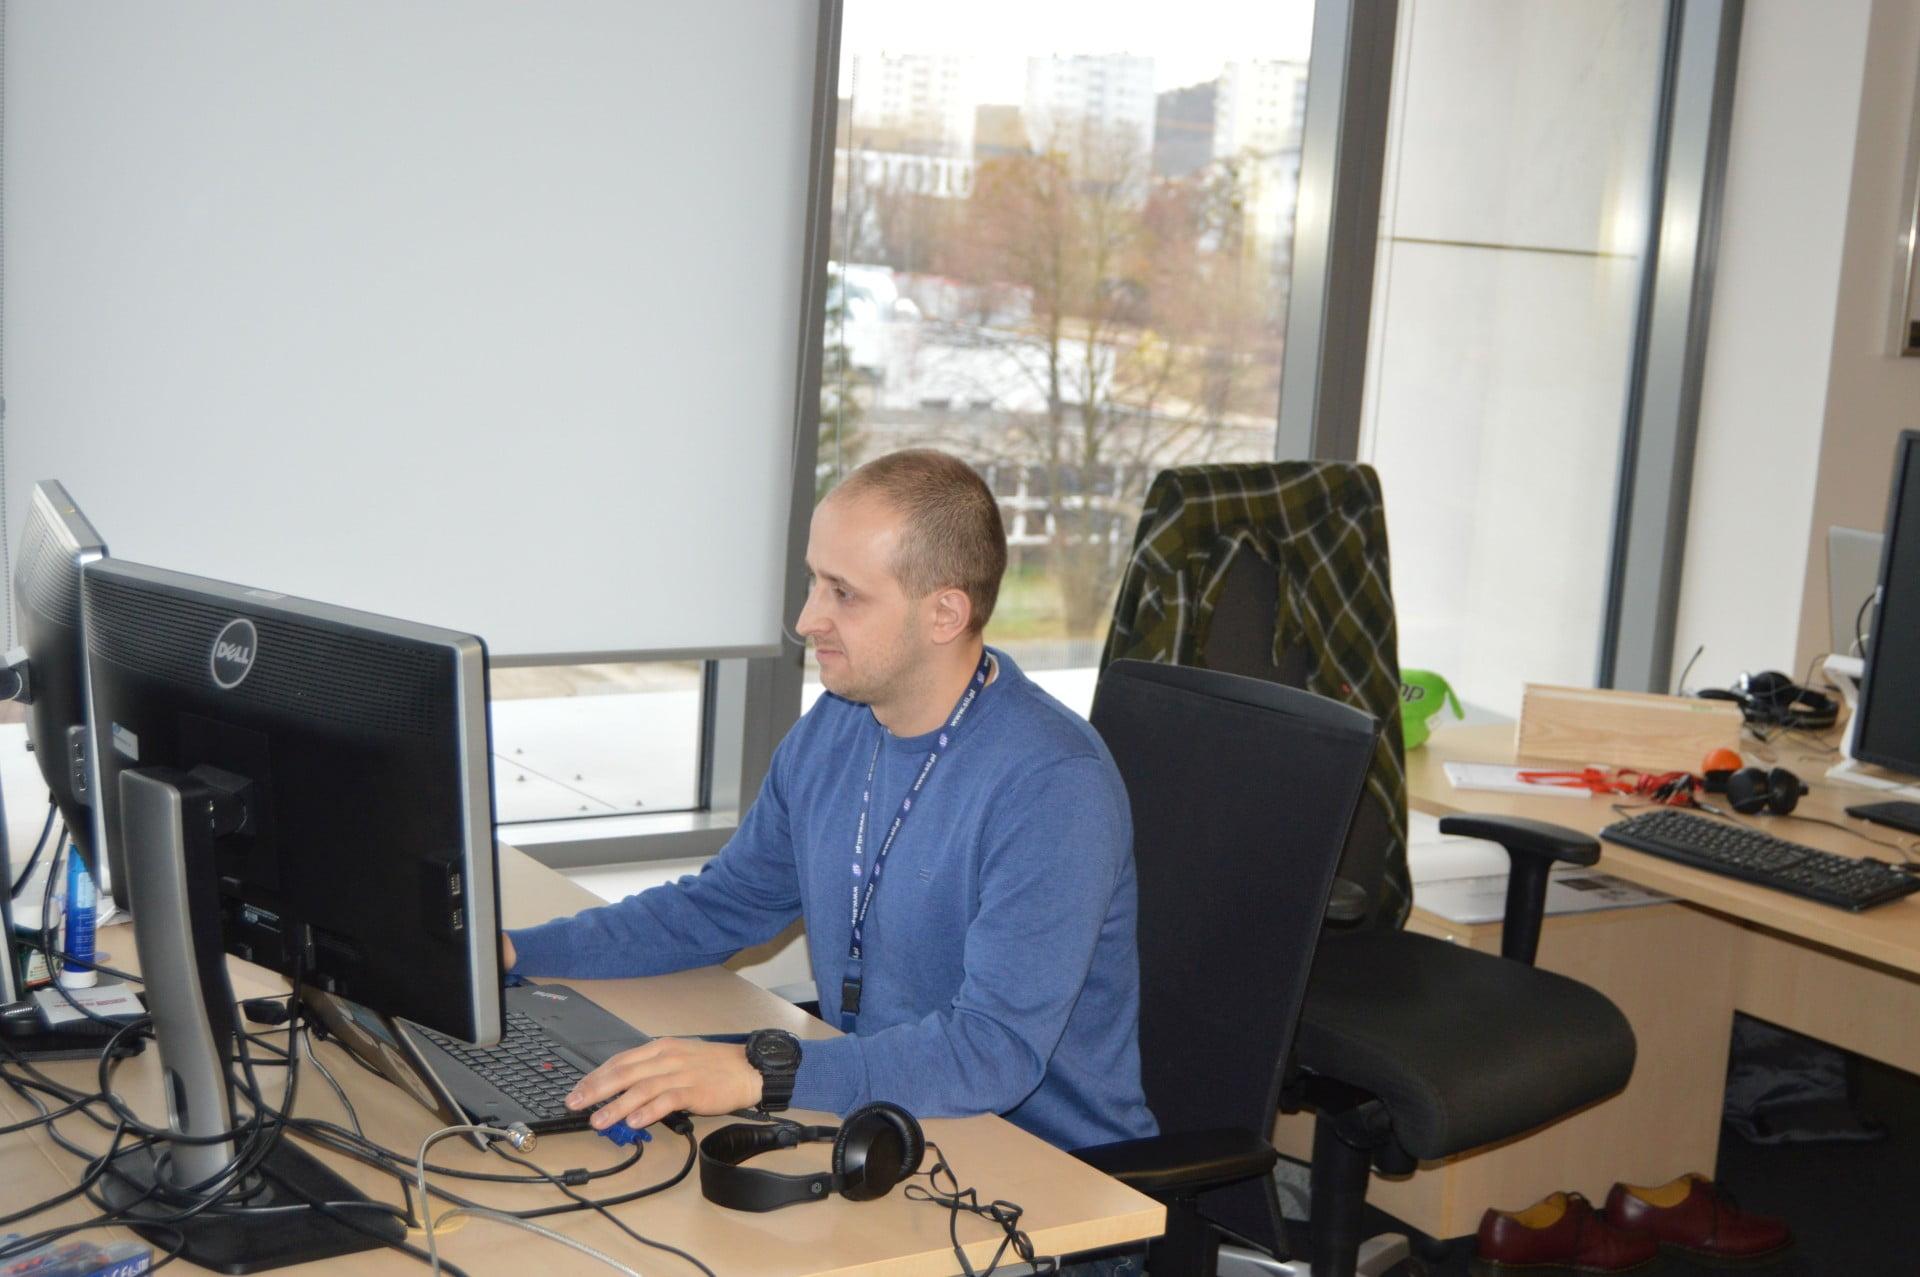 Praktyka Digital Sii web development